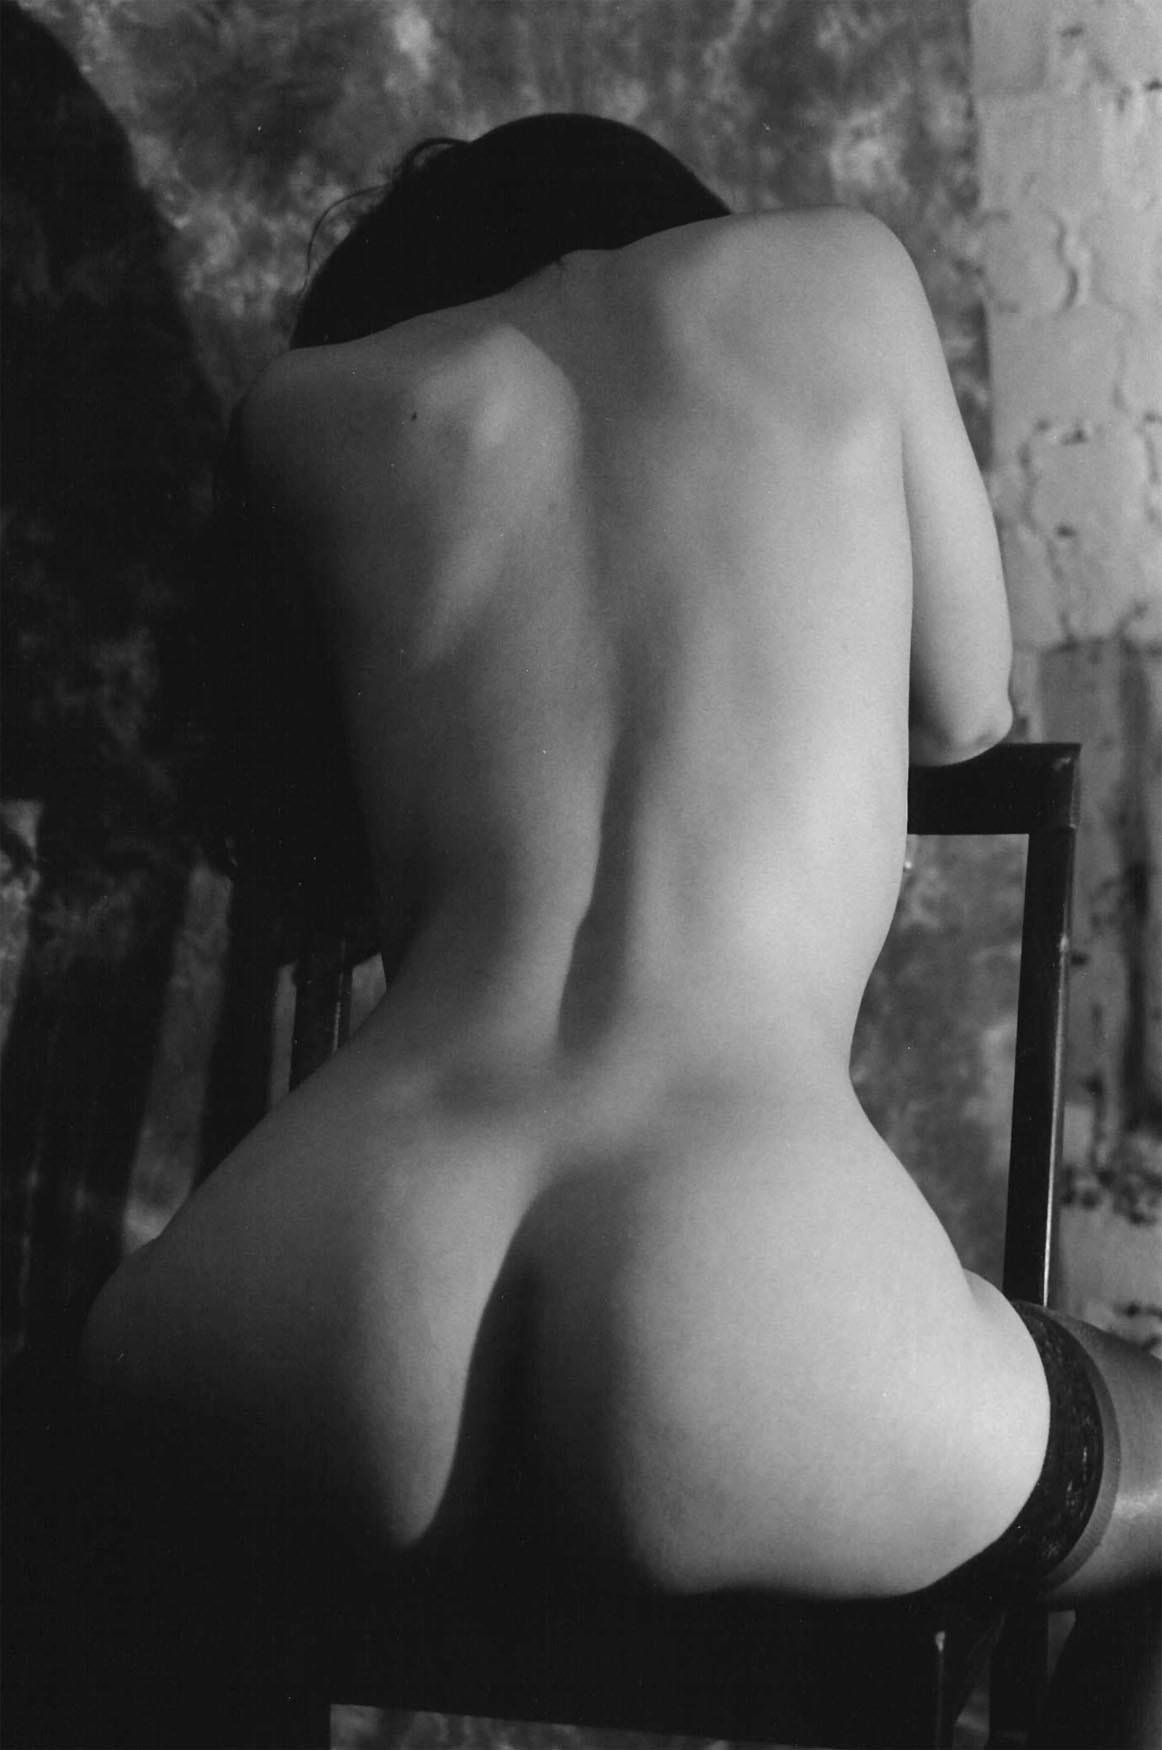 Erotic nude art photographs of men and women